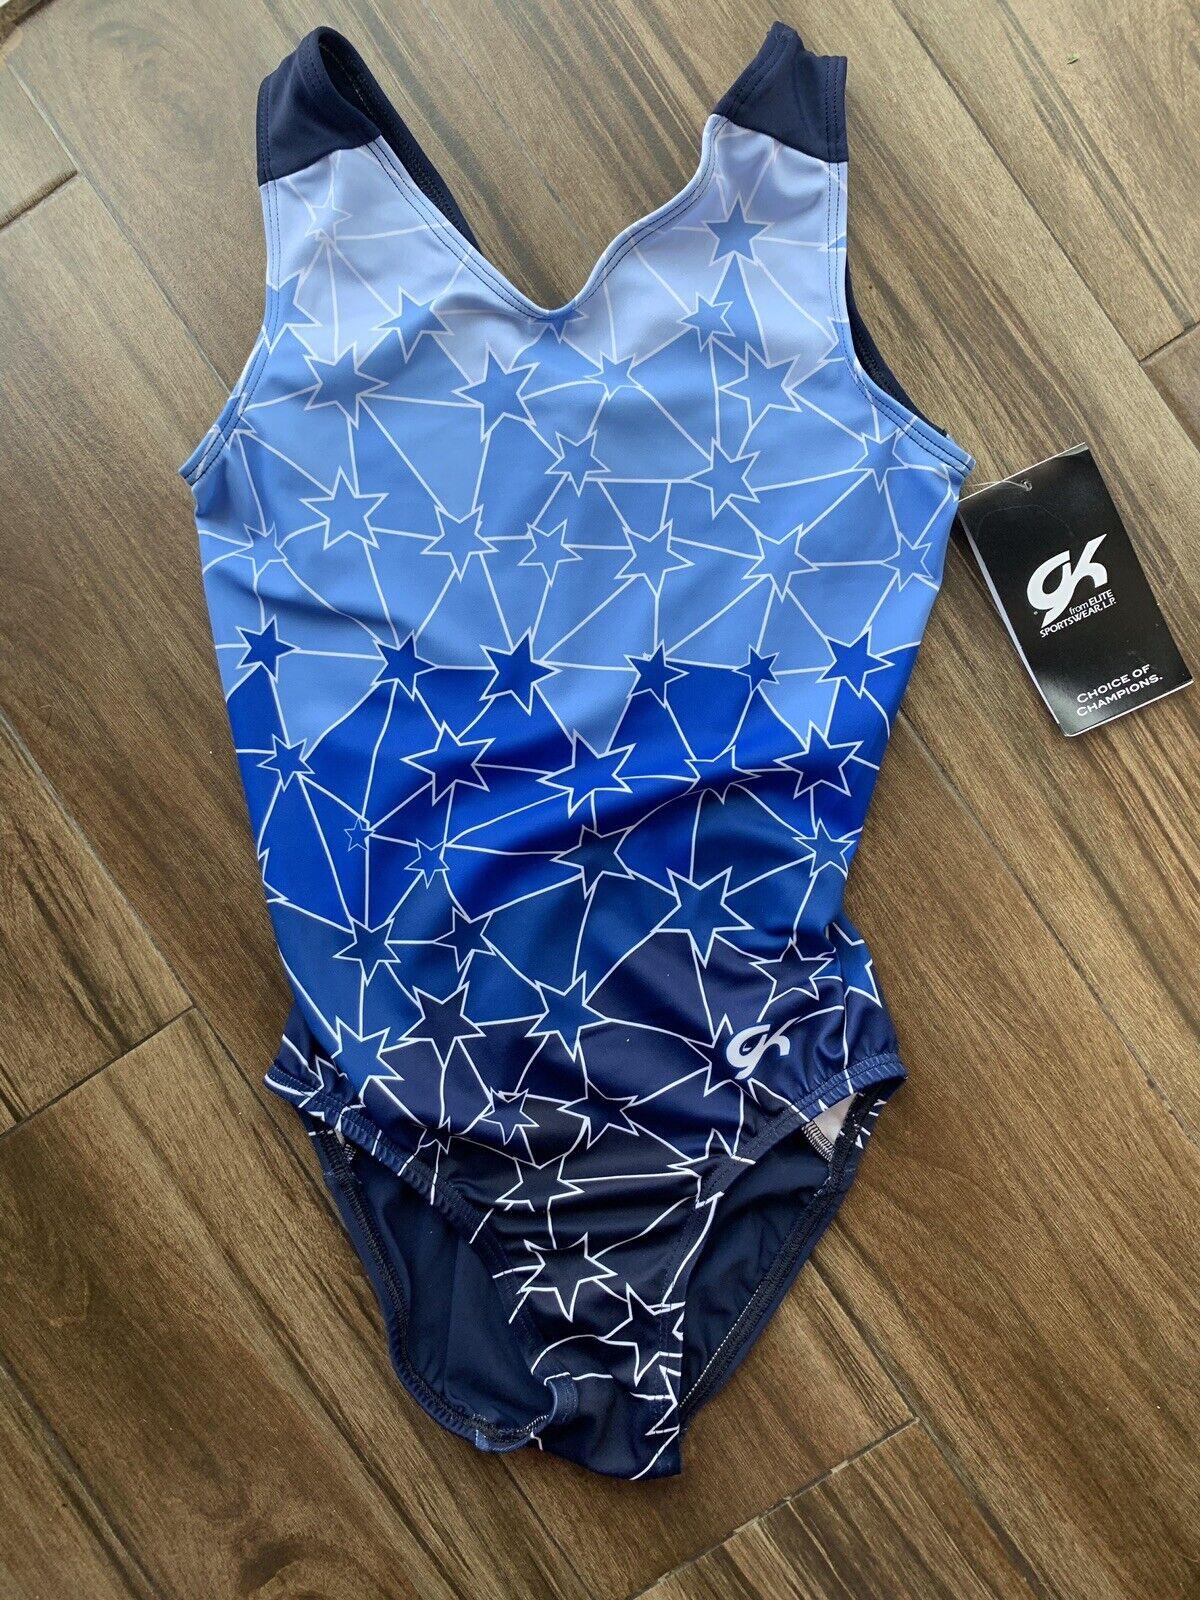 GK ELITE  GYMNASTICS LEOTARD blueE FADE STAR PRINT ADULT X-SMALL NEW  hot sales